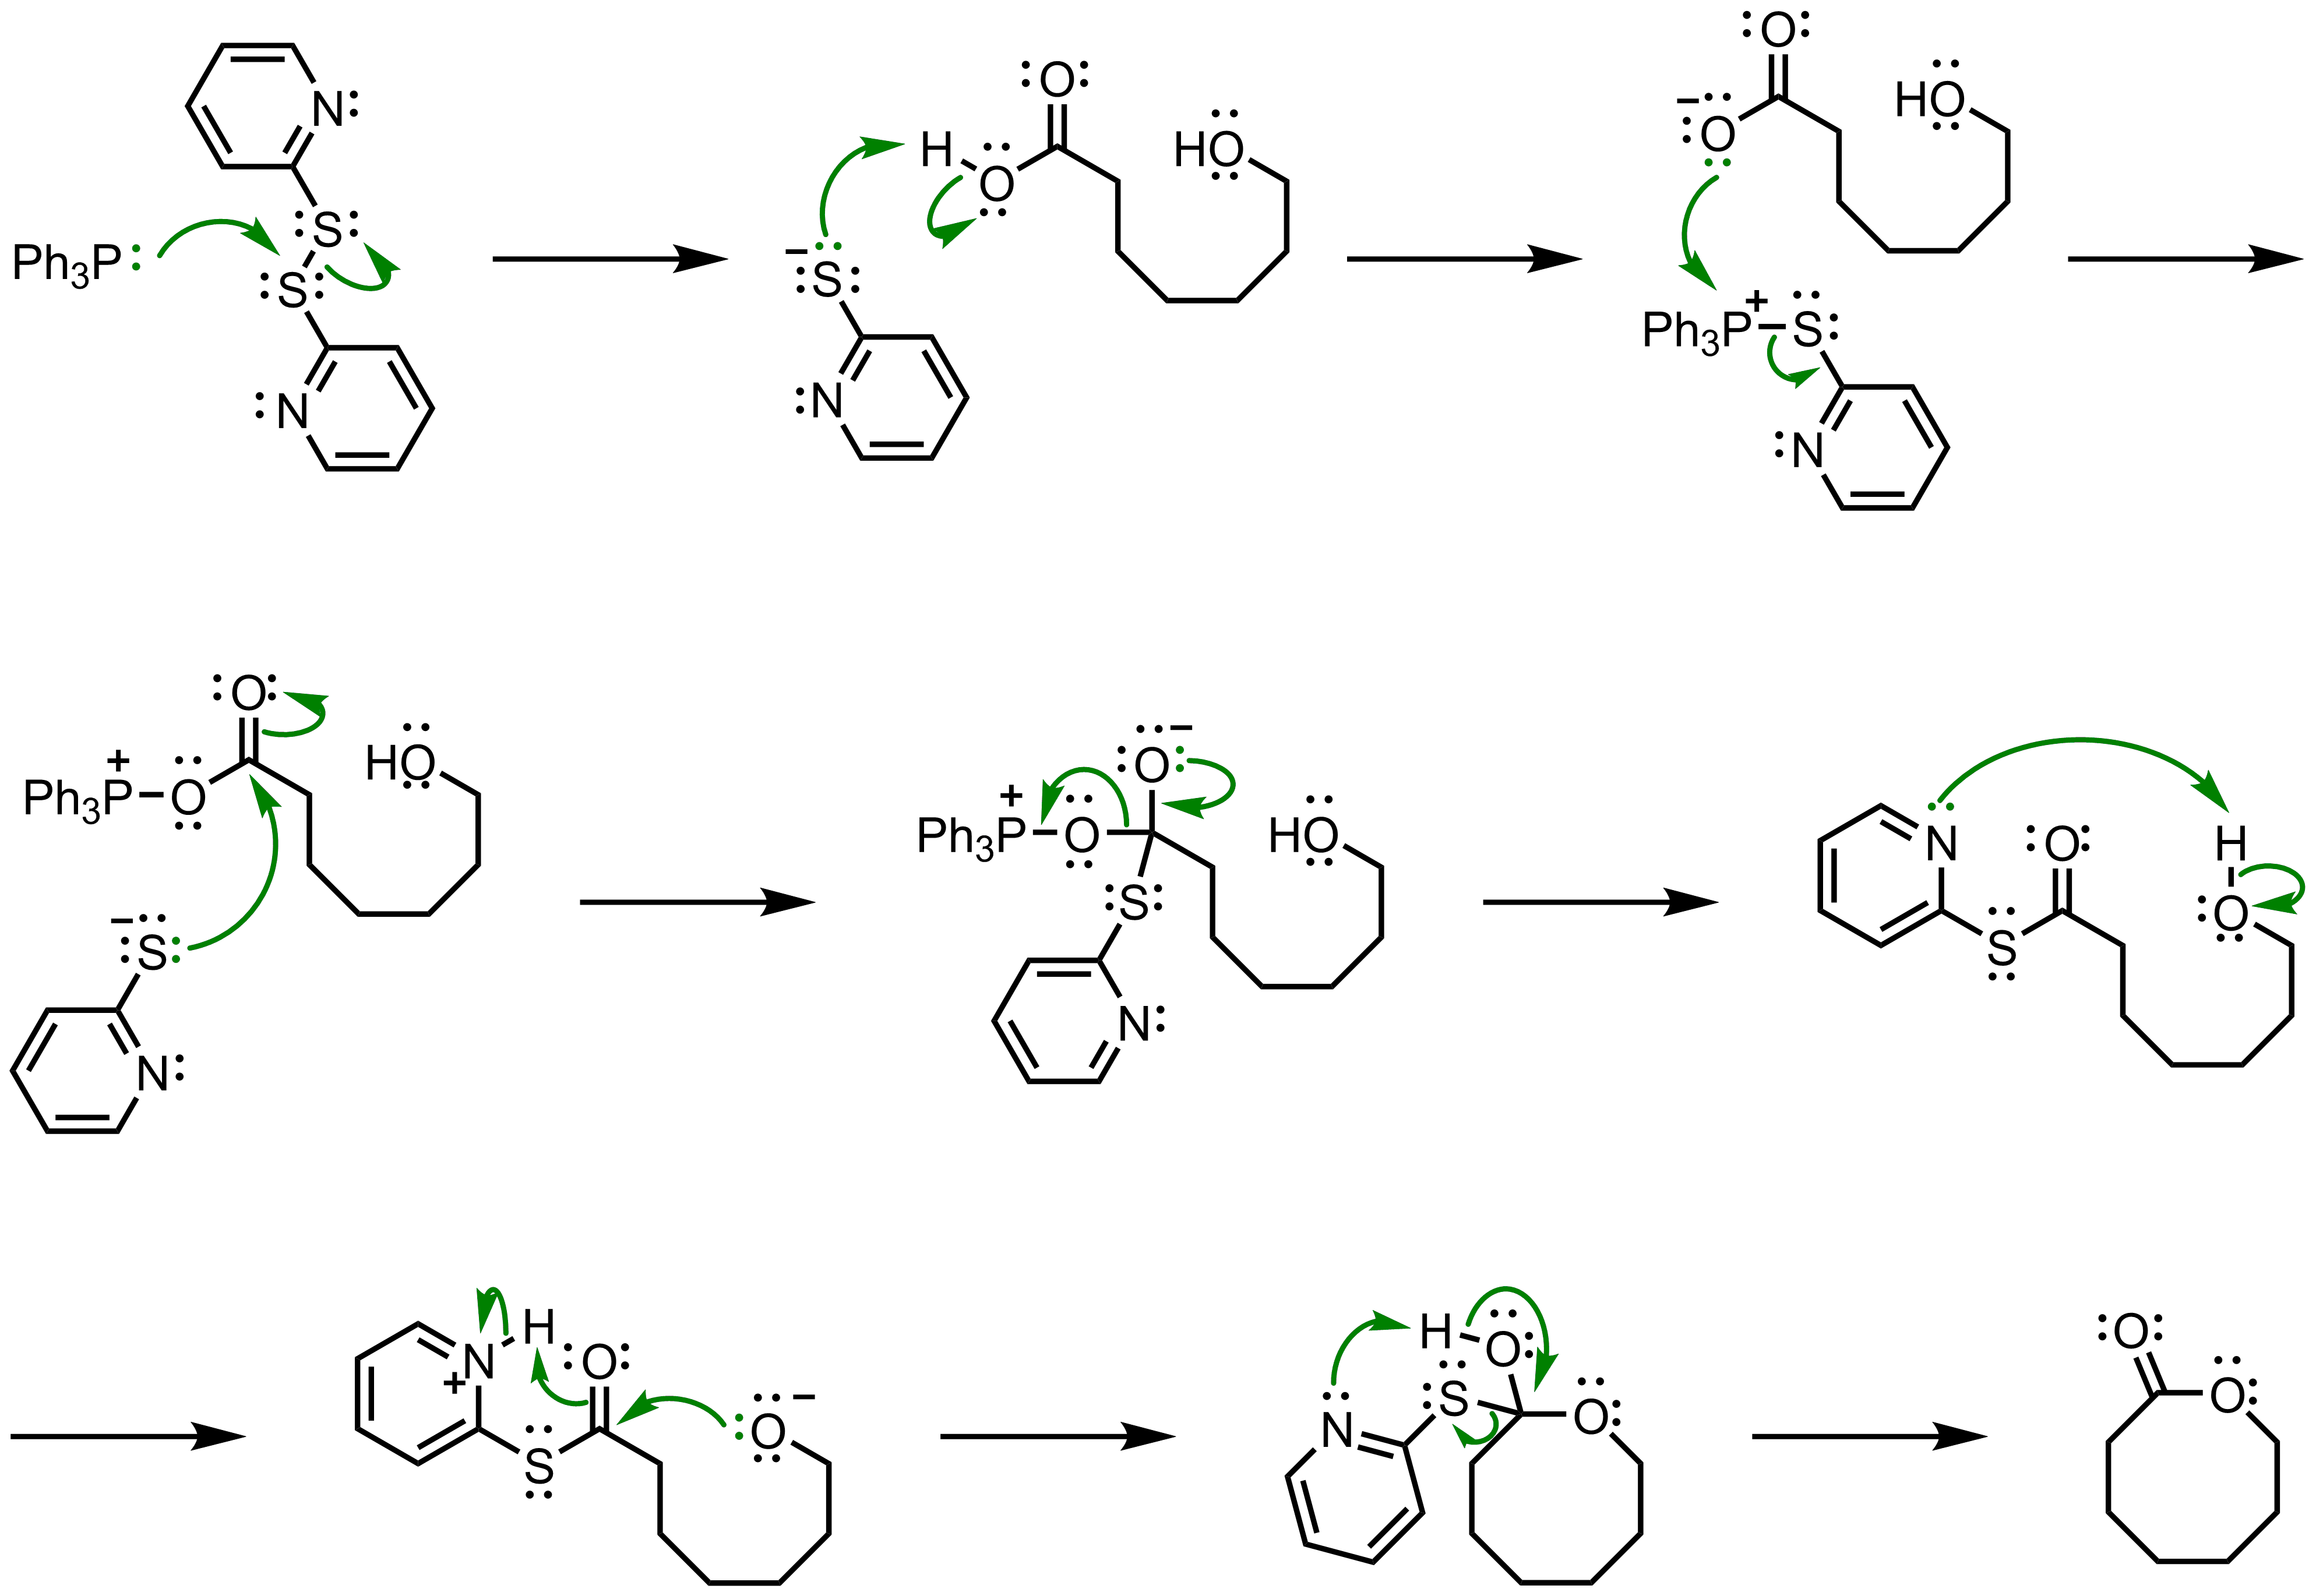 Mechanism of the Corey-Nicolaou Macrolactonization